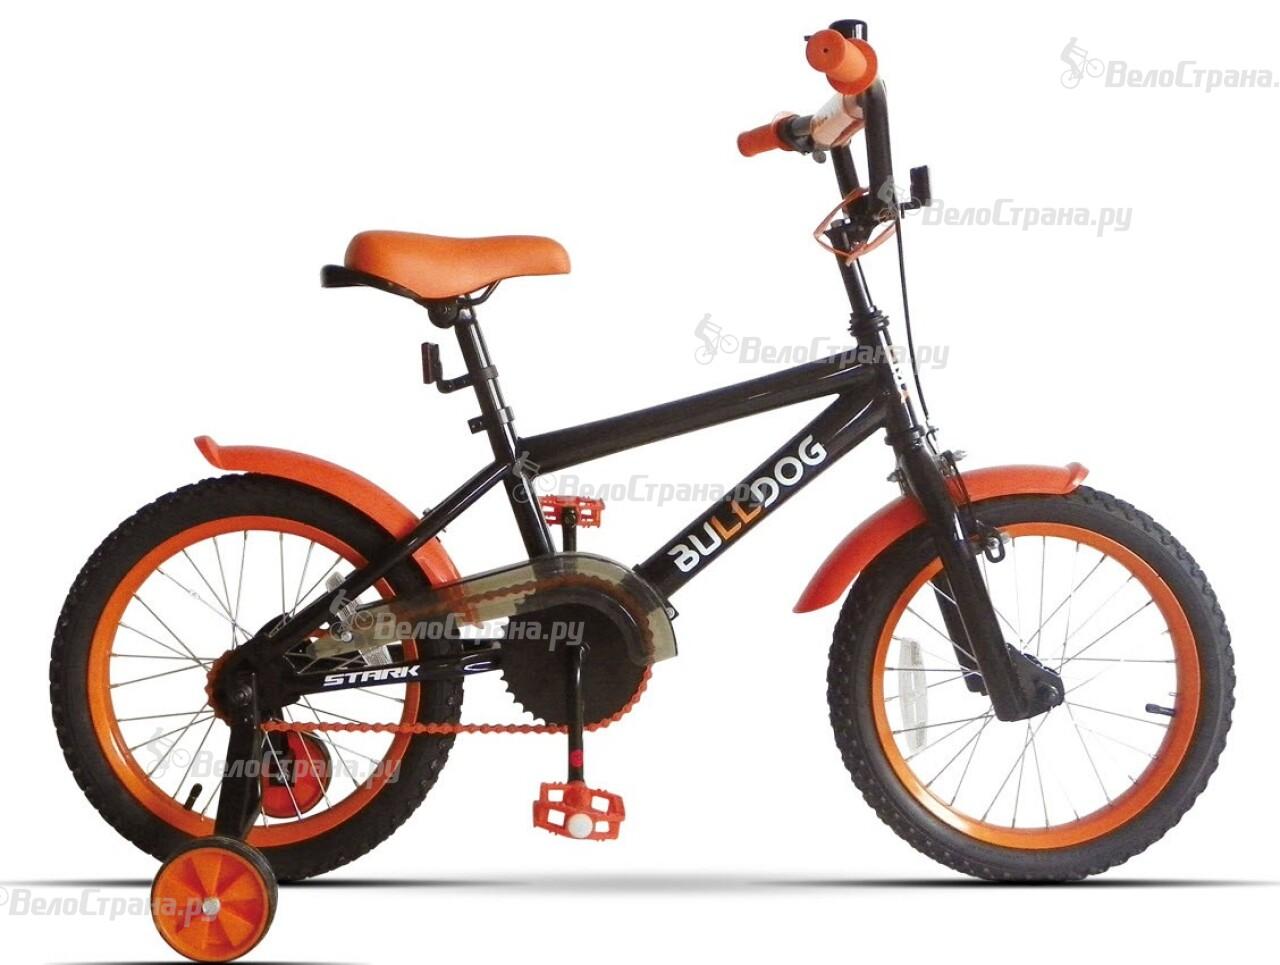 Велосипед Stark Bulldog 16 (2016) stark outpost 16 2016 blue orange